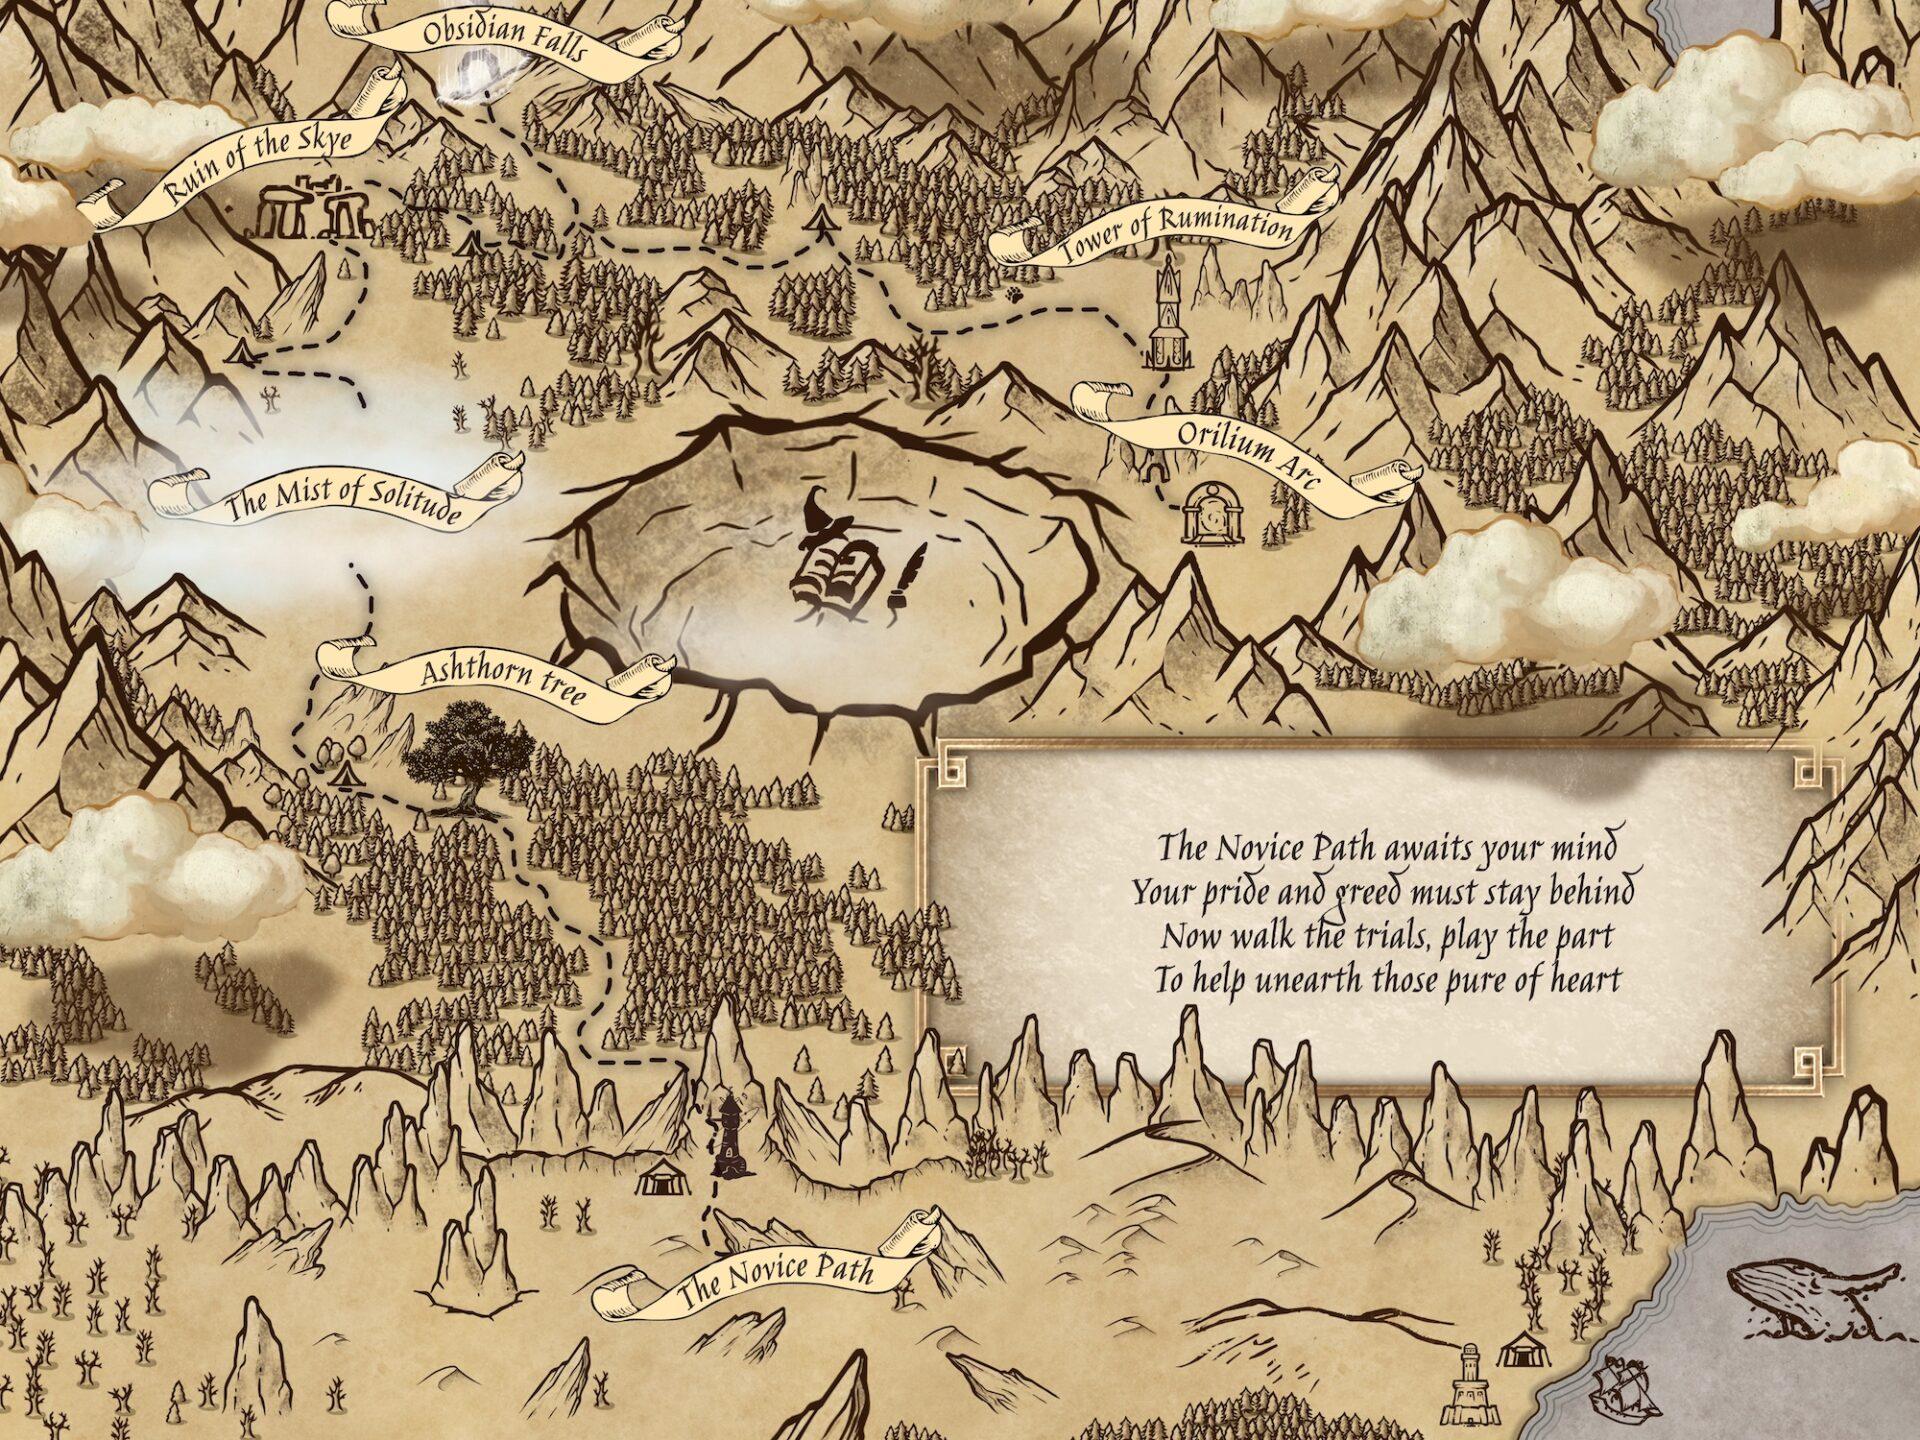 the novice path map